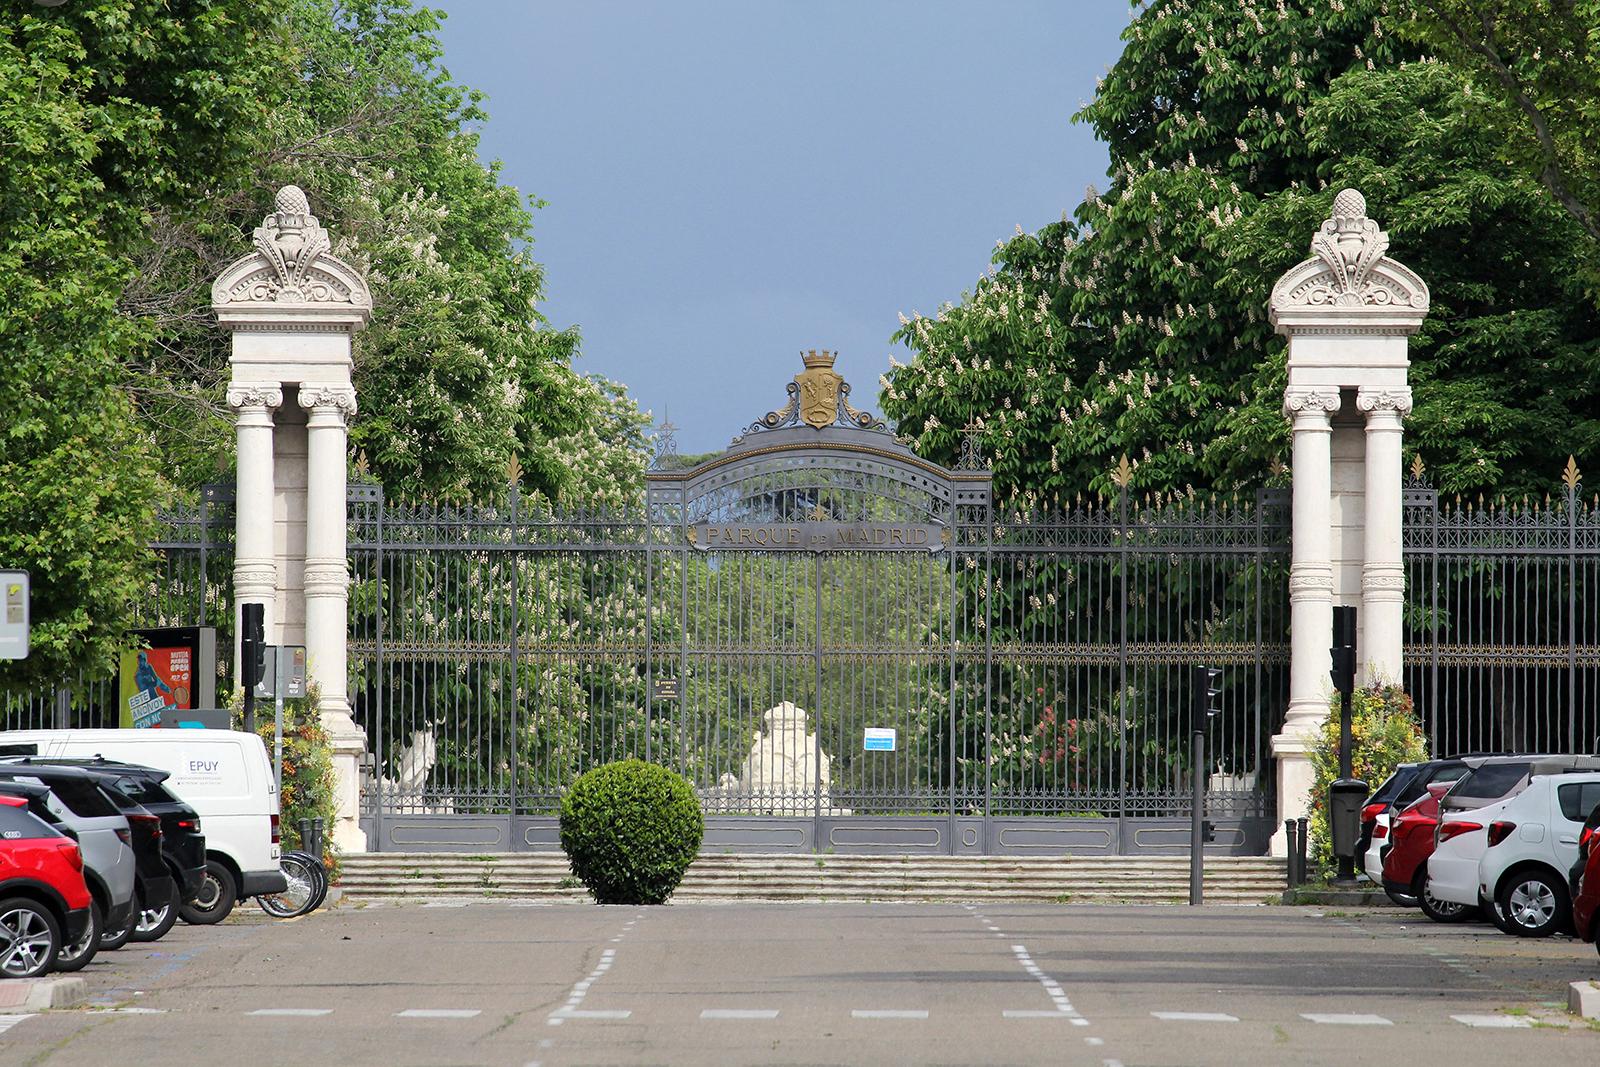 The closed gates of Madrid's El Retiro Park are seen on Monday, April 27.